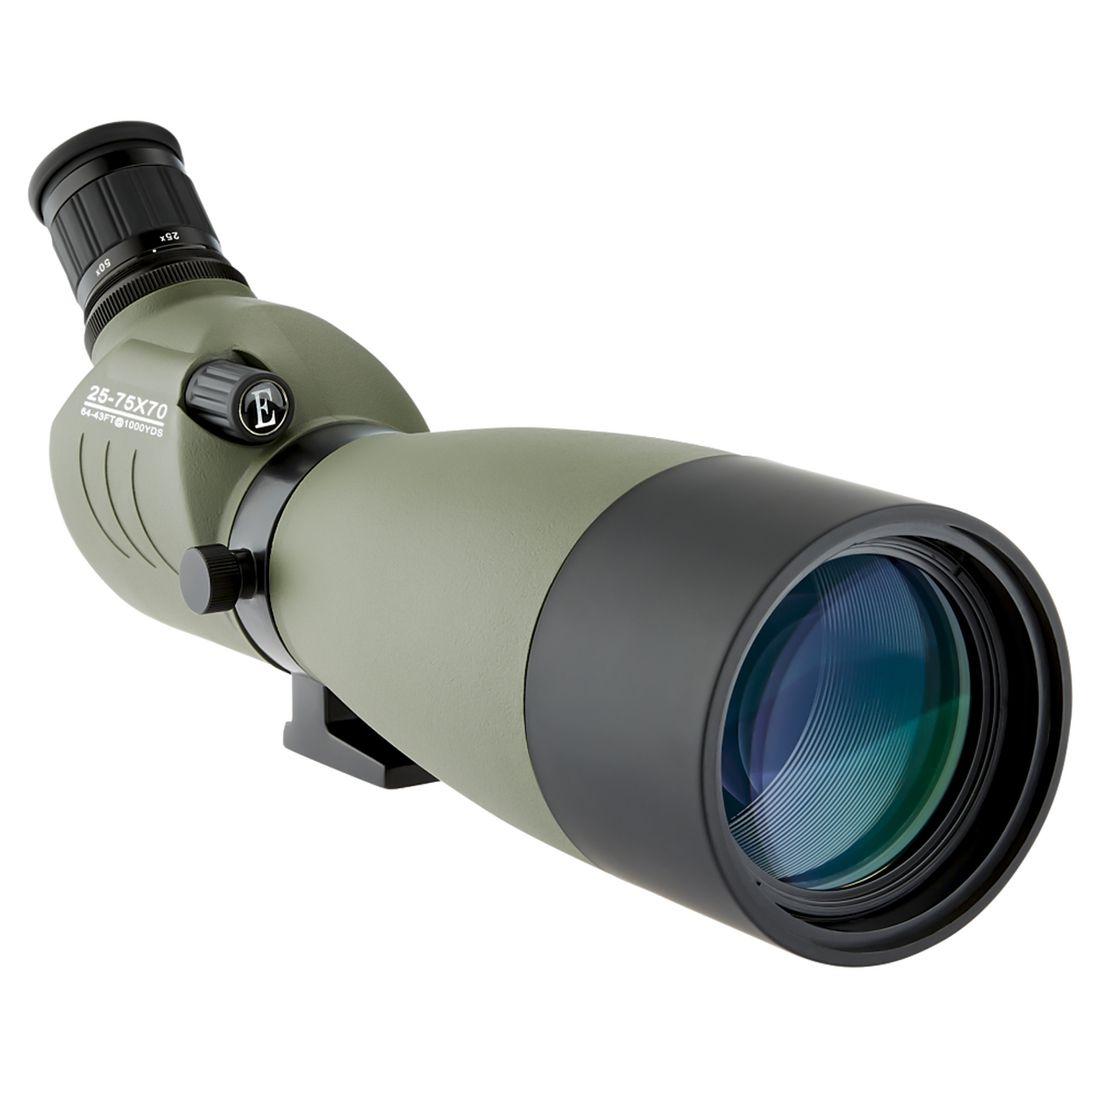 Luneta 70mm Skylife Tactical 25-75x70 Waterproof